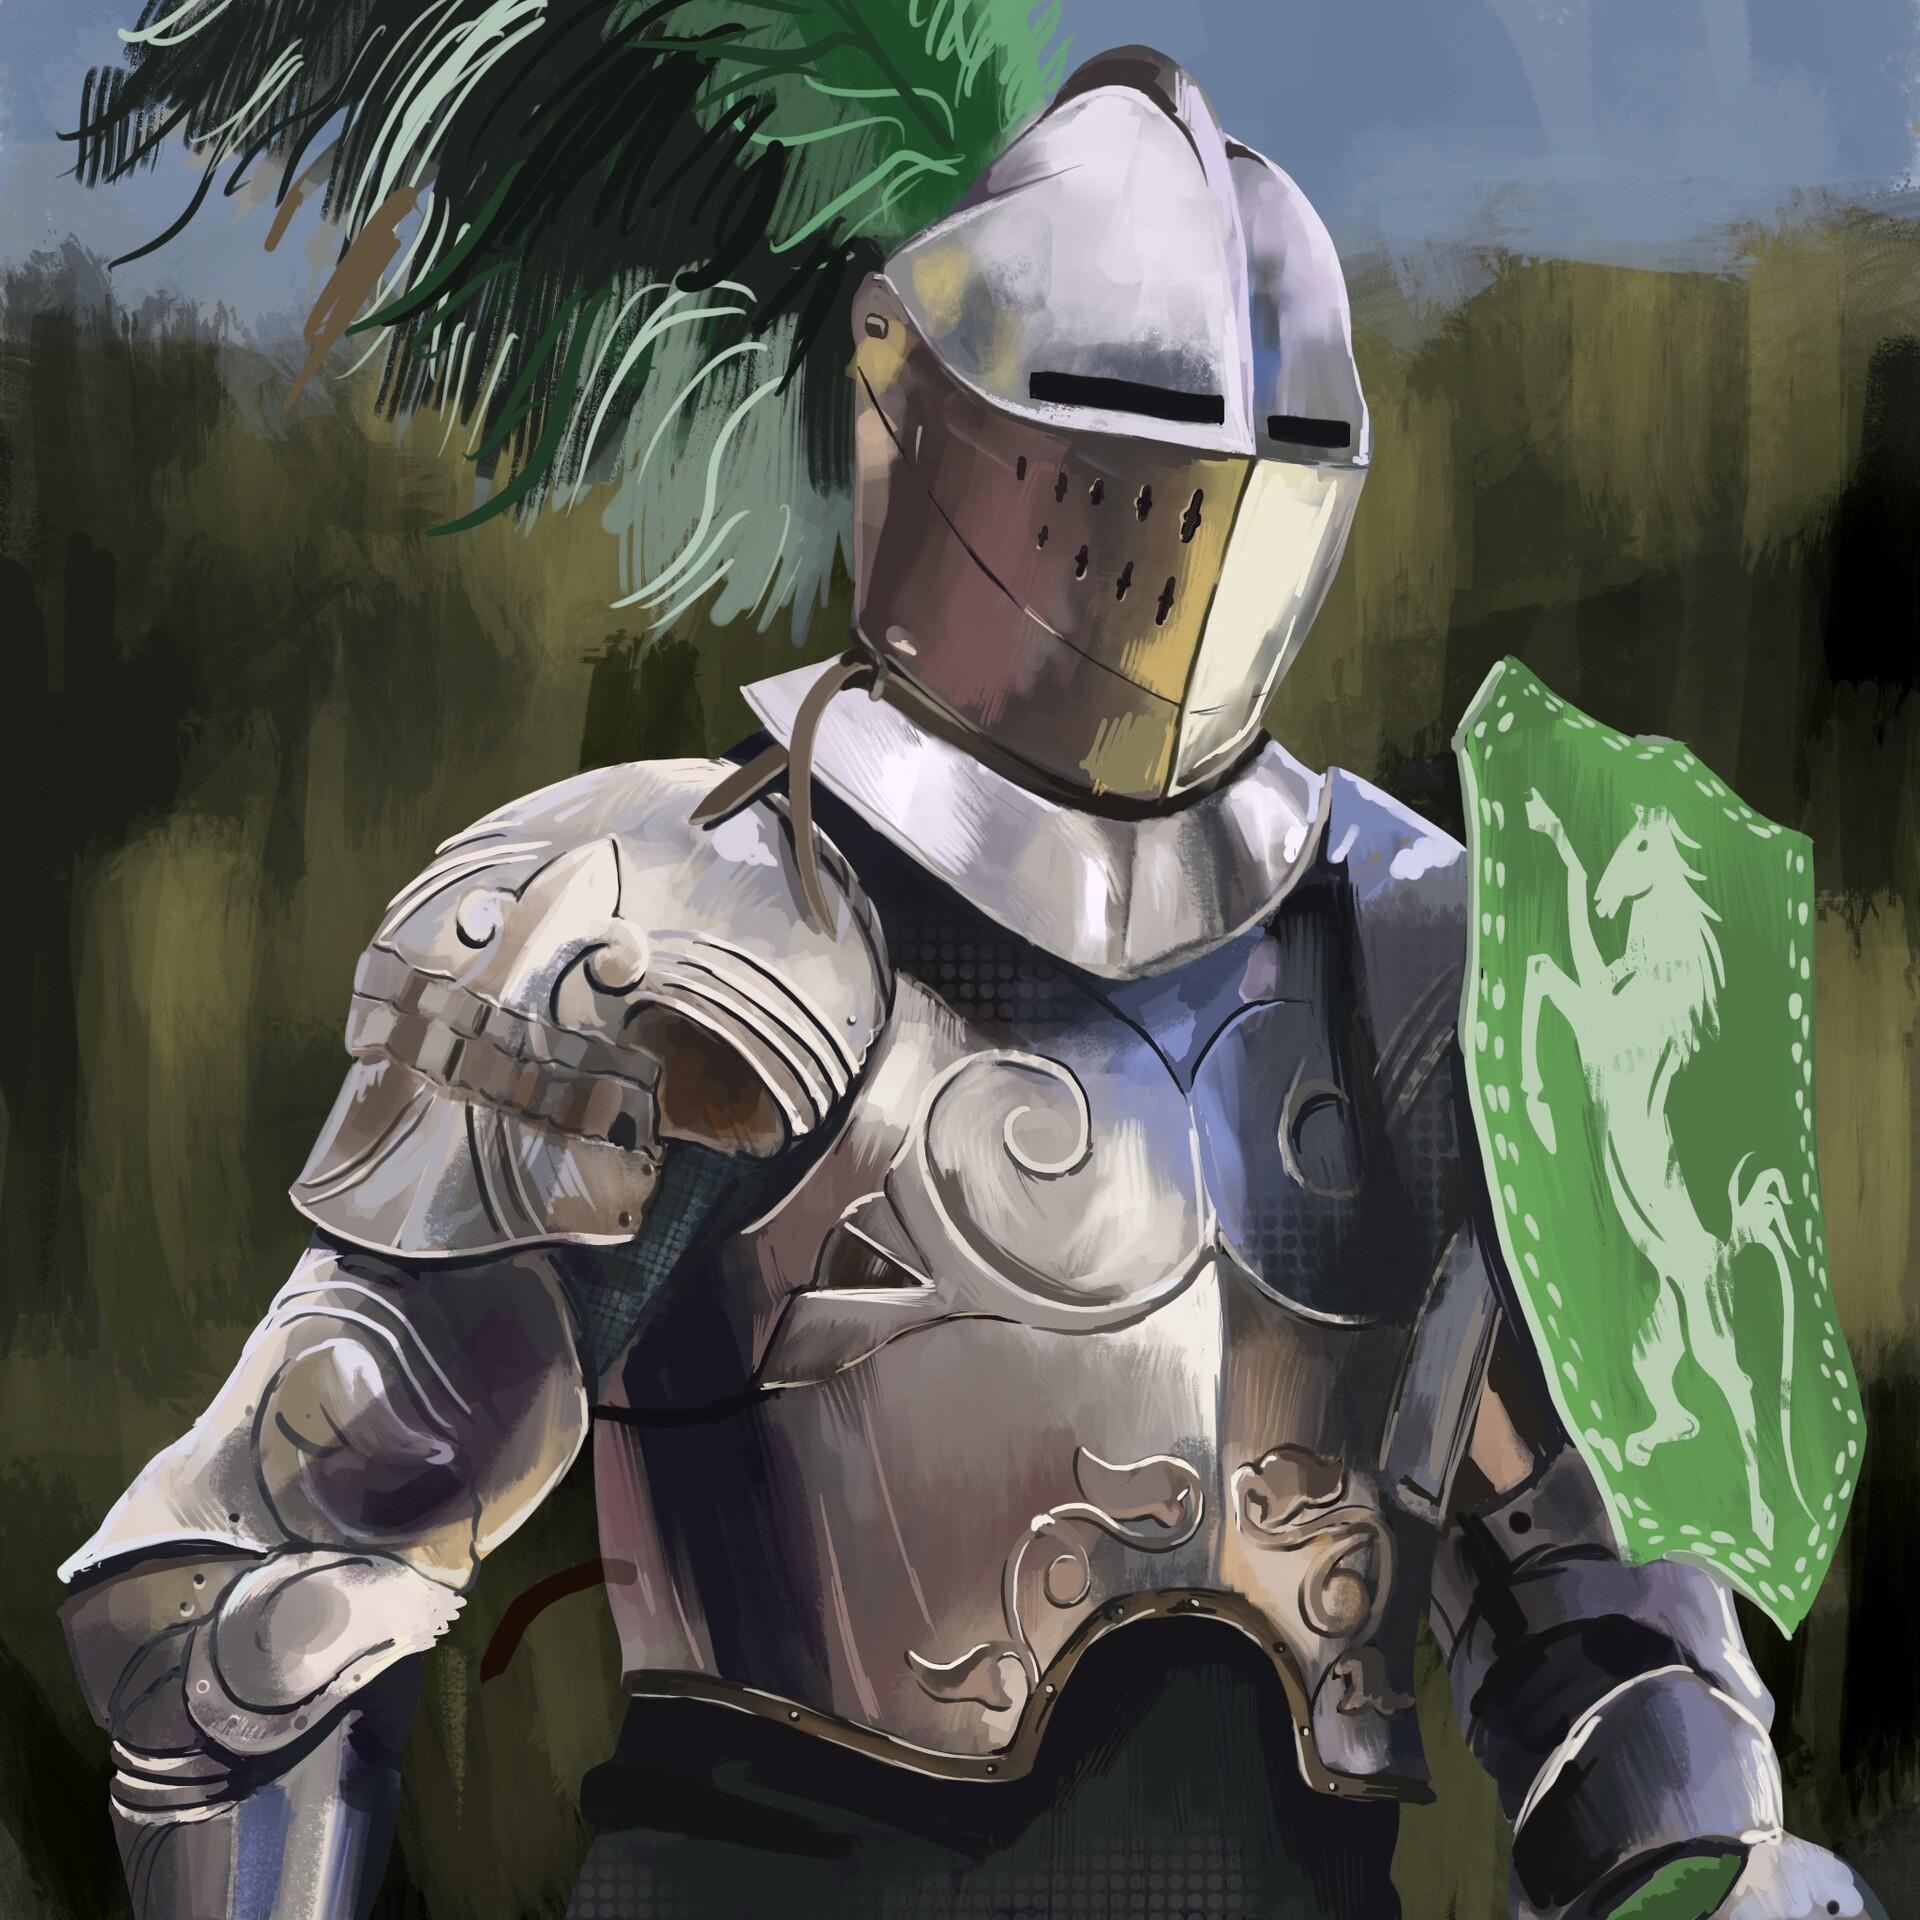 eric-carpe-study-knight-ii.jpg?156528731